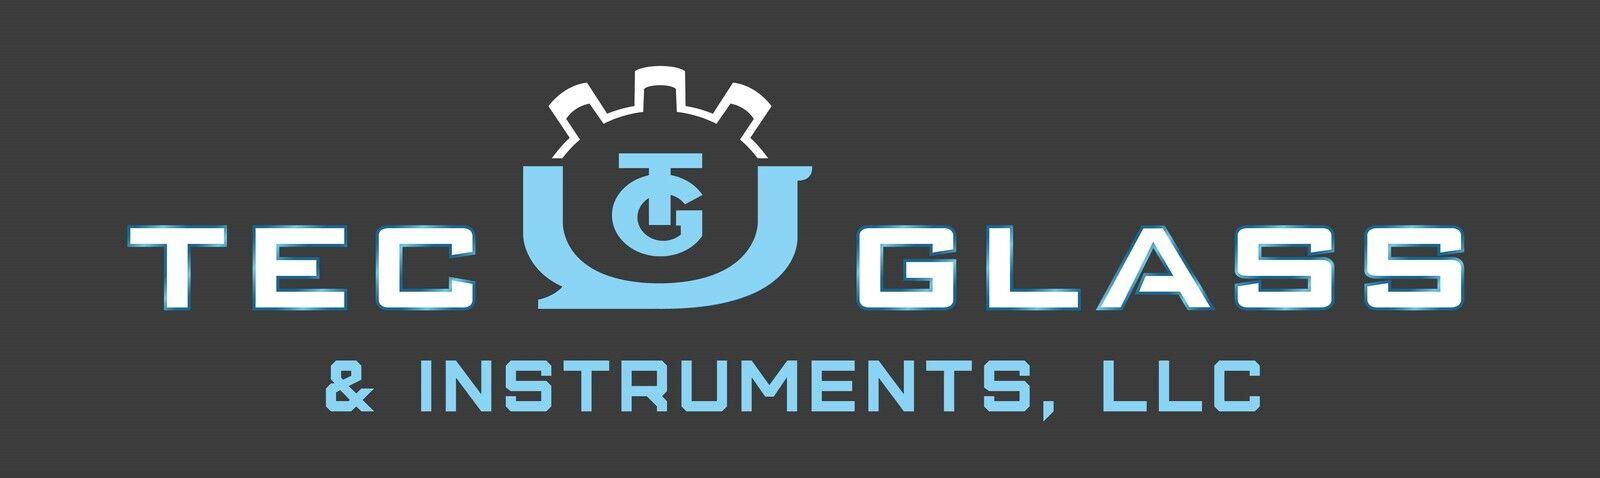 Tecglass and Instruments